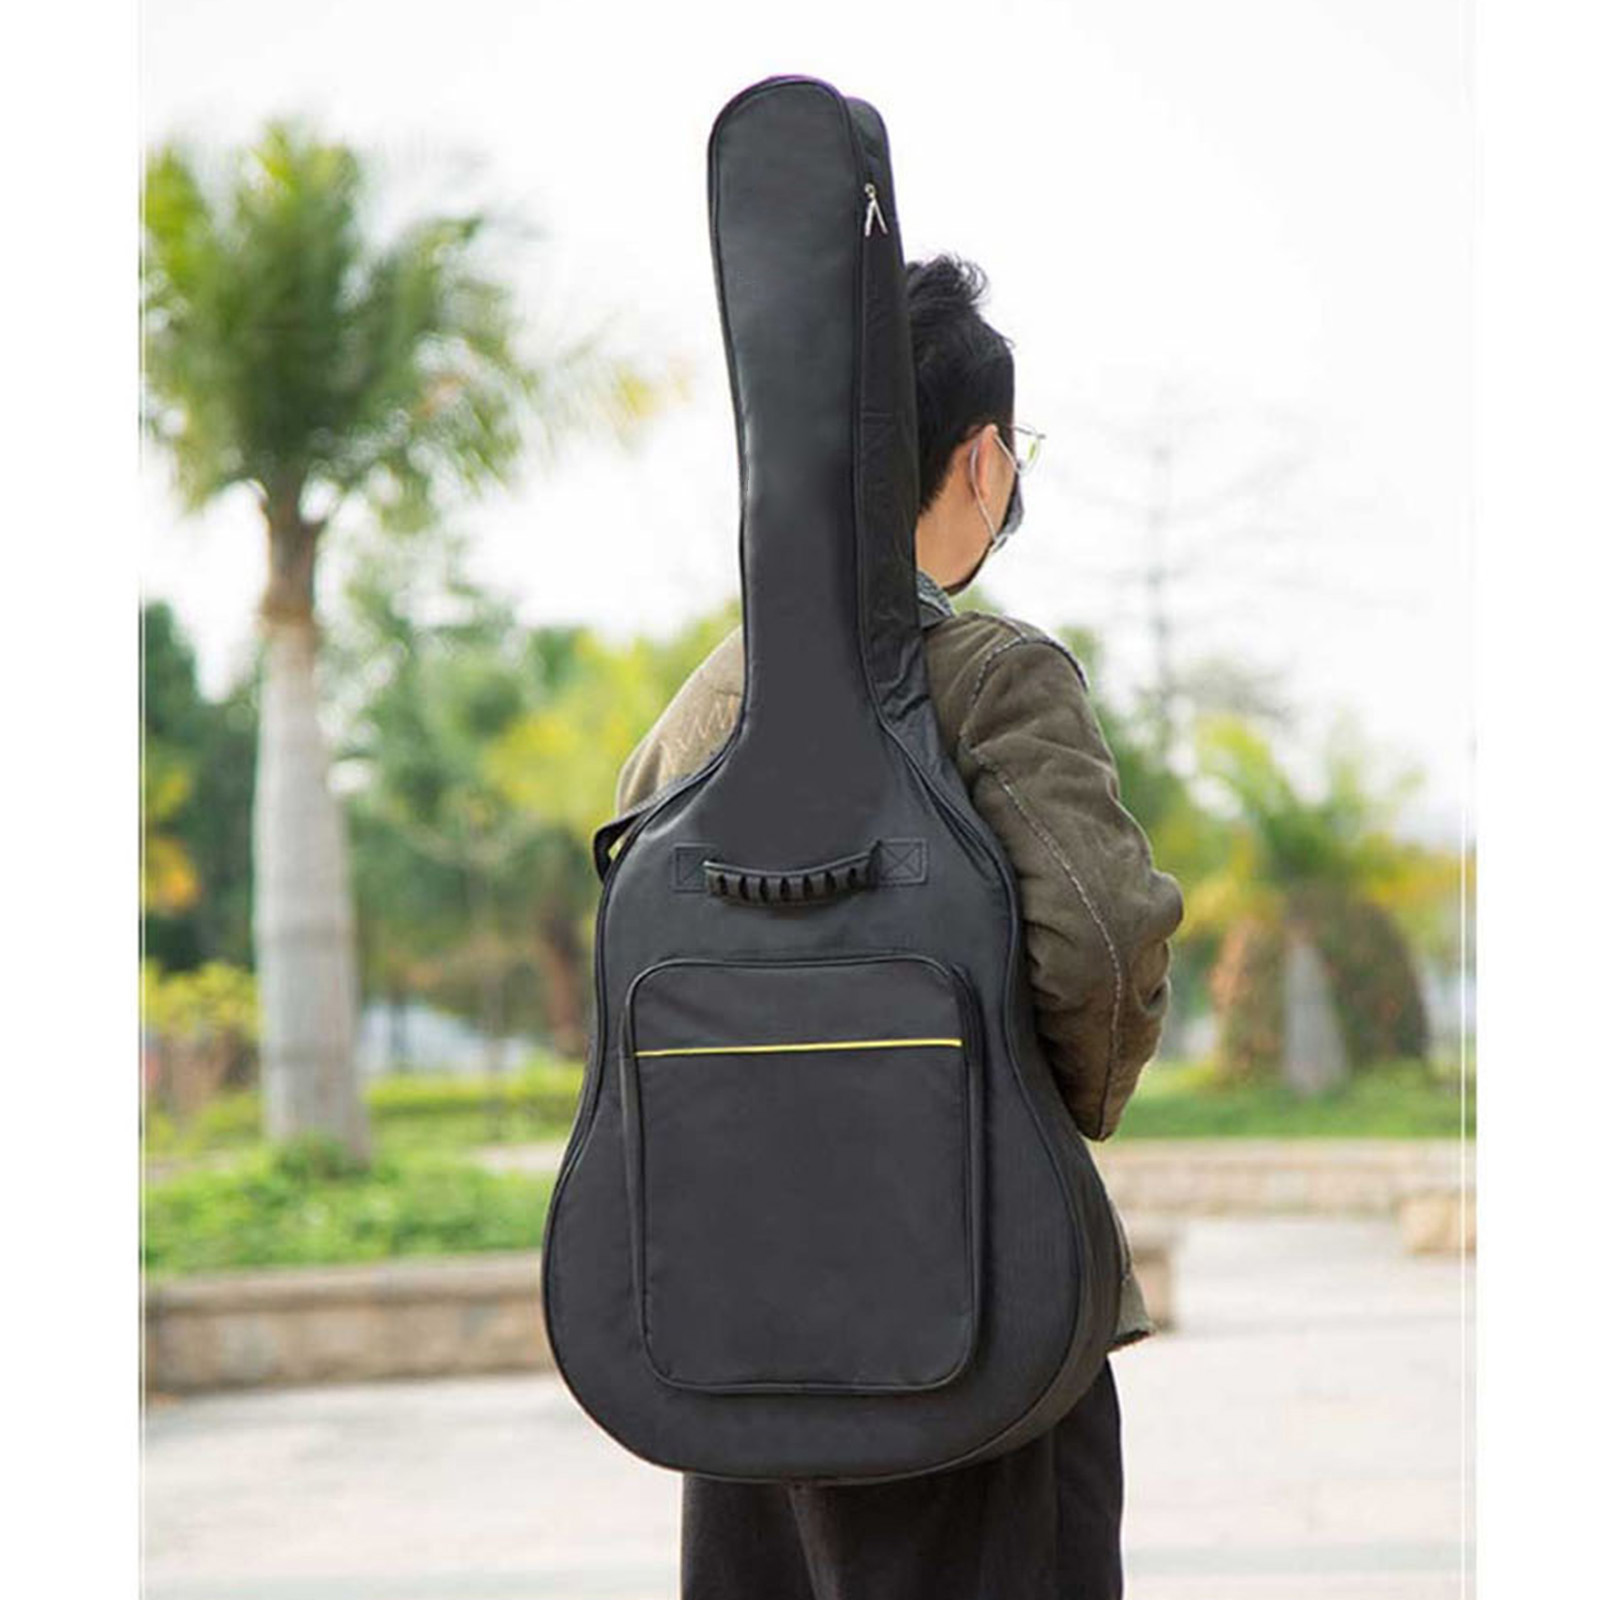 36'' inch Acoustic/Electric Guitar Folk Bag Waterproof Travel Guitar Case Guitar Carrying Bag Cotton Padded Adjustable Strap